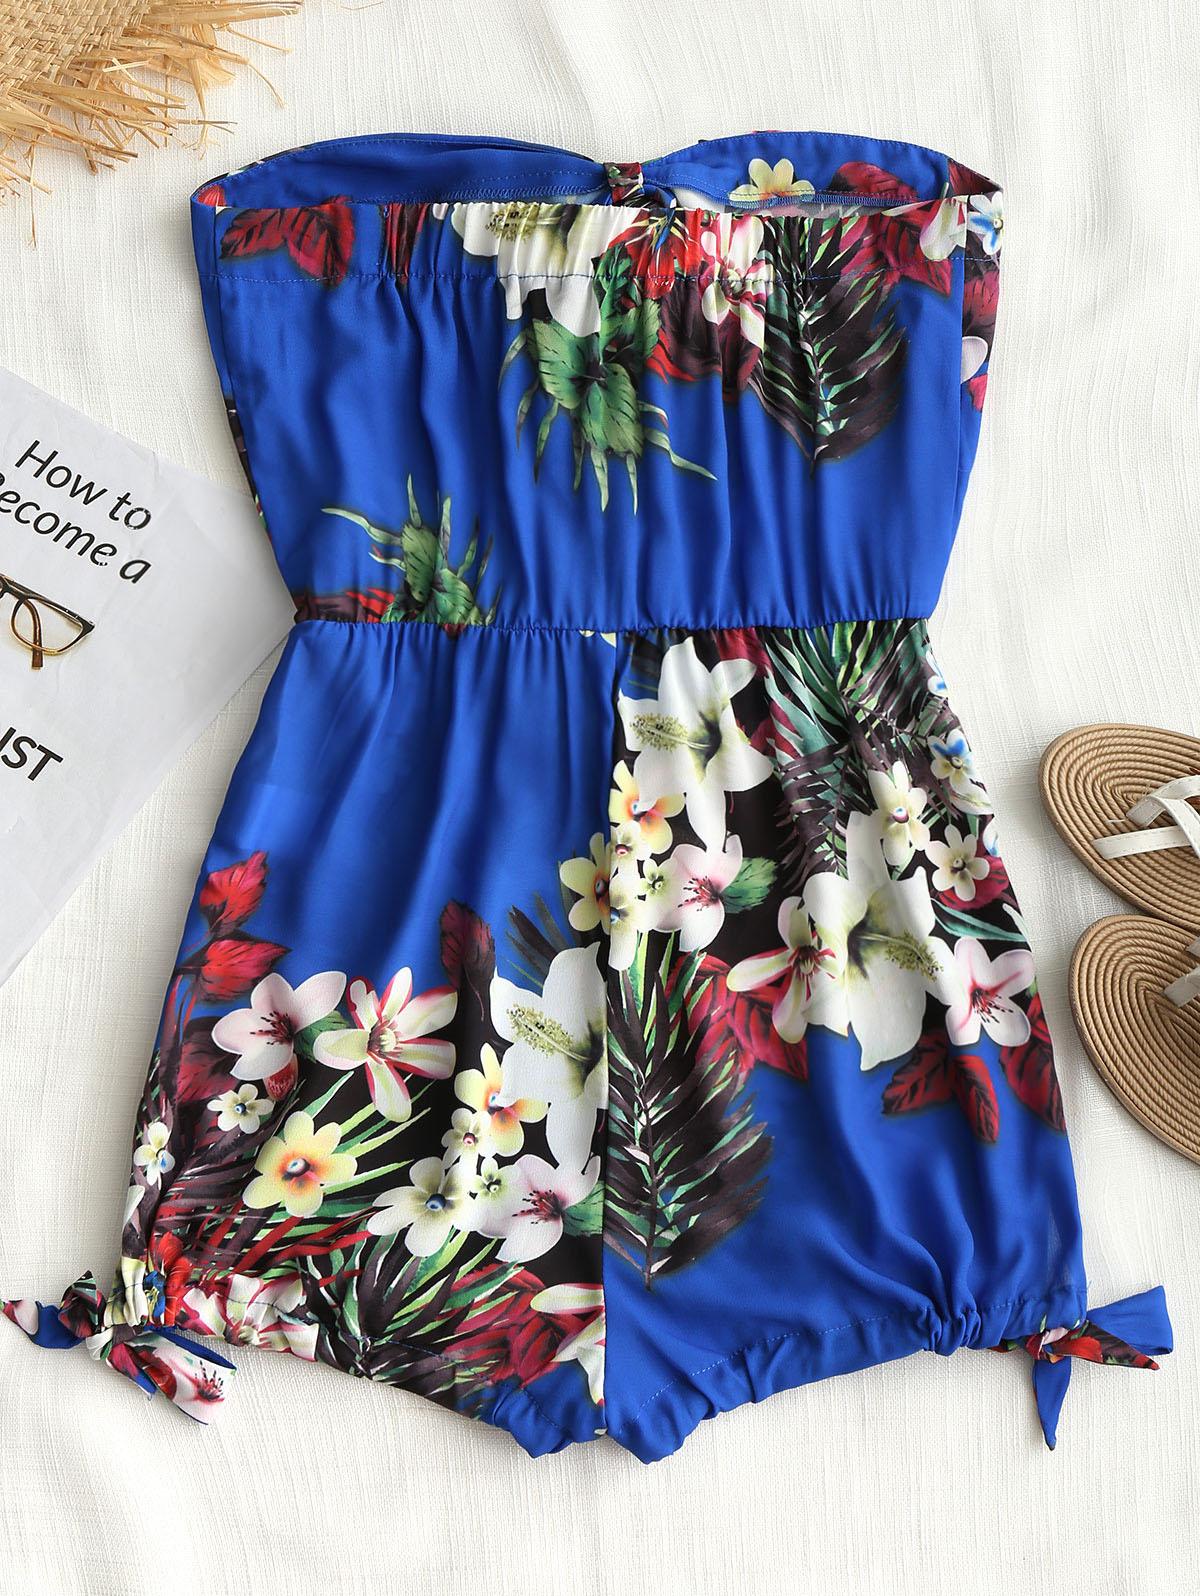 AZULINA Cute Flower Knotted Boobtube Women Romper Strapless Tropical Floral Print Elastic Waist Jumpsuits Summer Beach Overalls